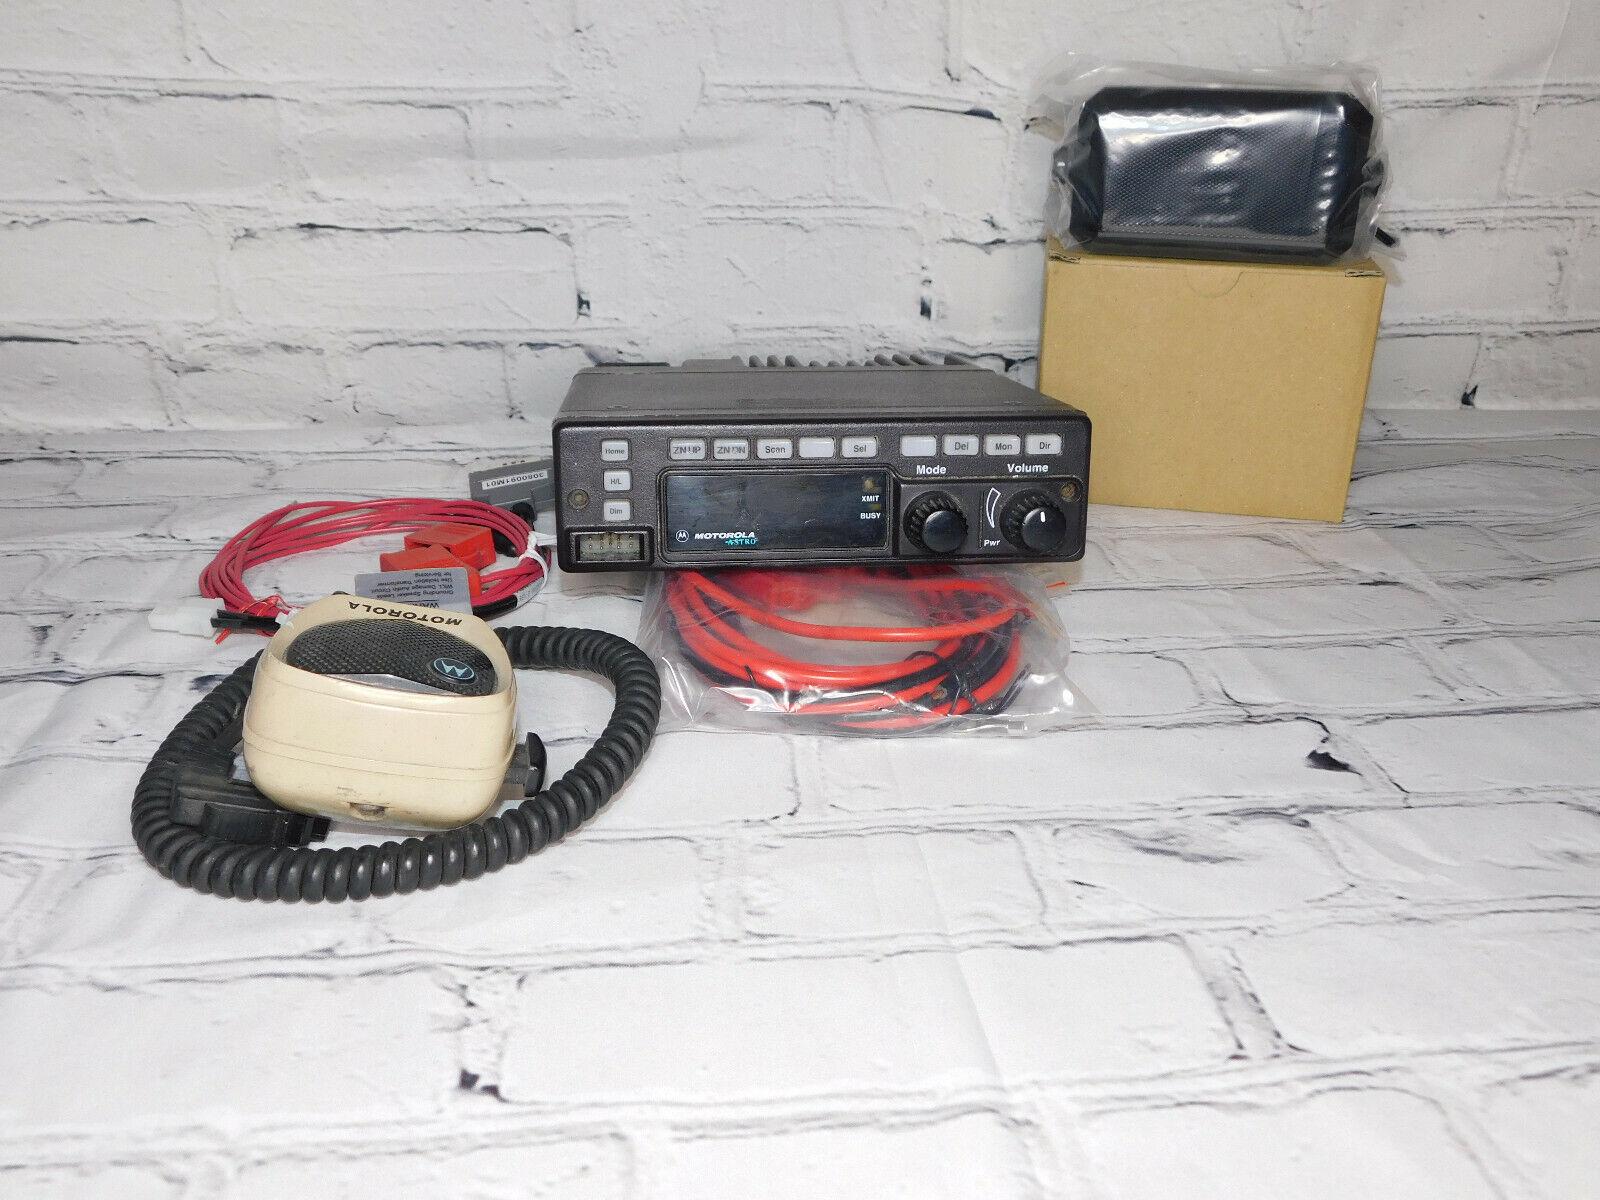 Motorola VHF Astro spectra W4 P25 Digital Mobile radio W/ AES/DES Encryption . Available Now for 175.00